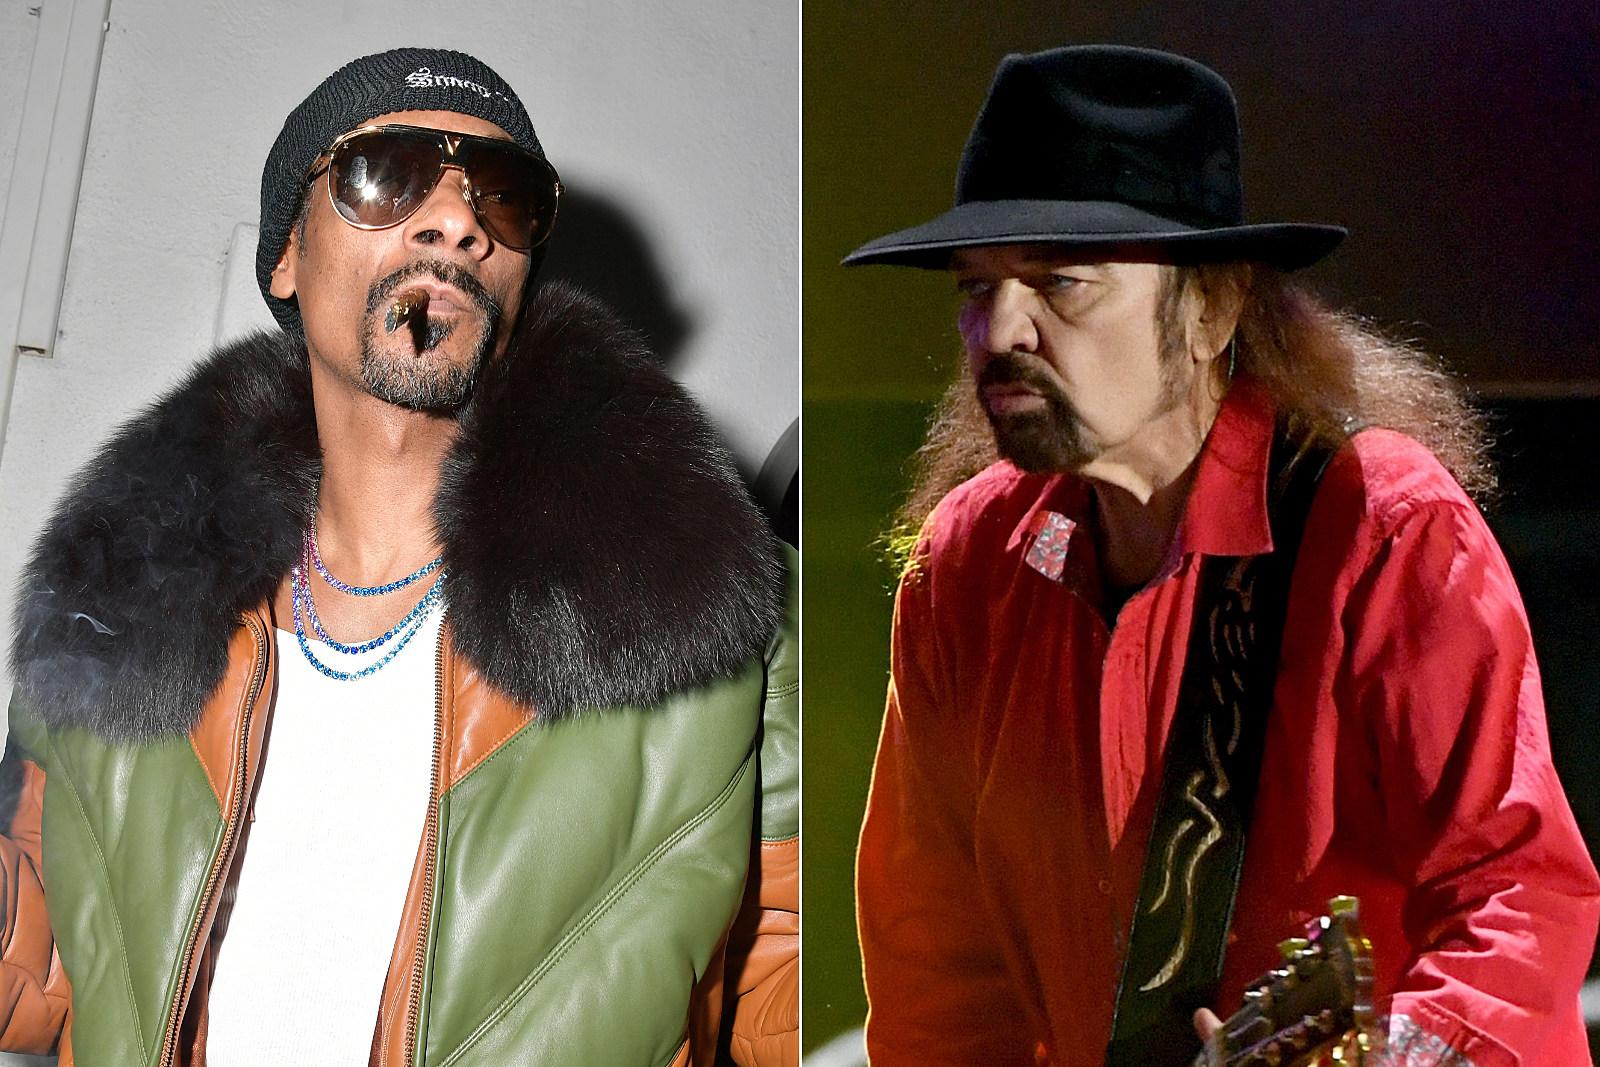 Watch Snoop Dogg Smoke Weed With Lynyrd Skynyrd